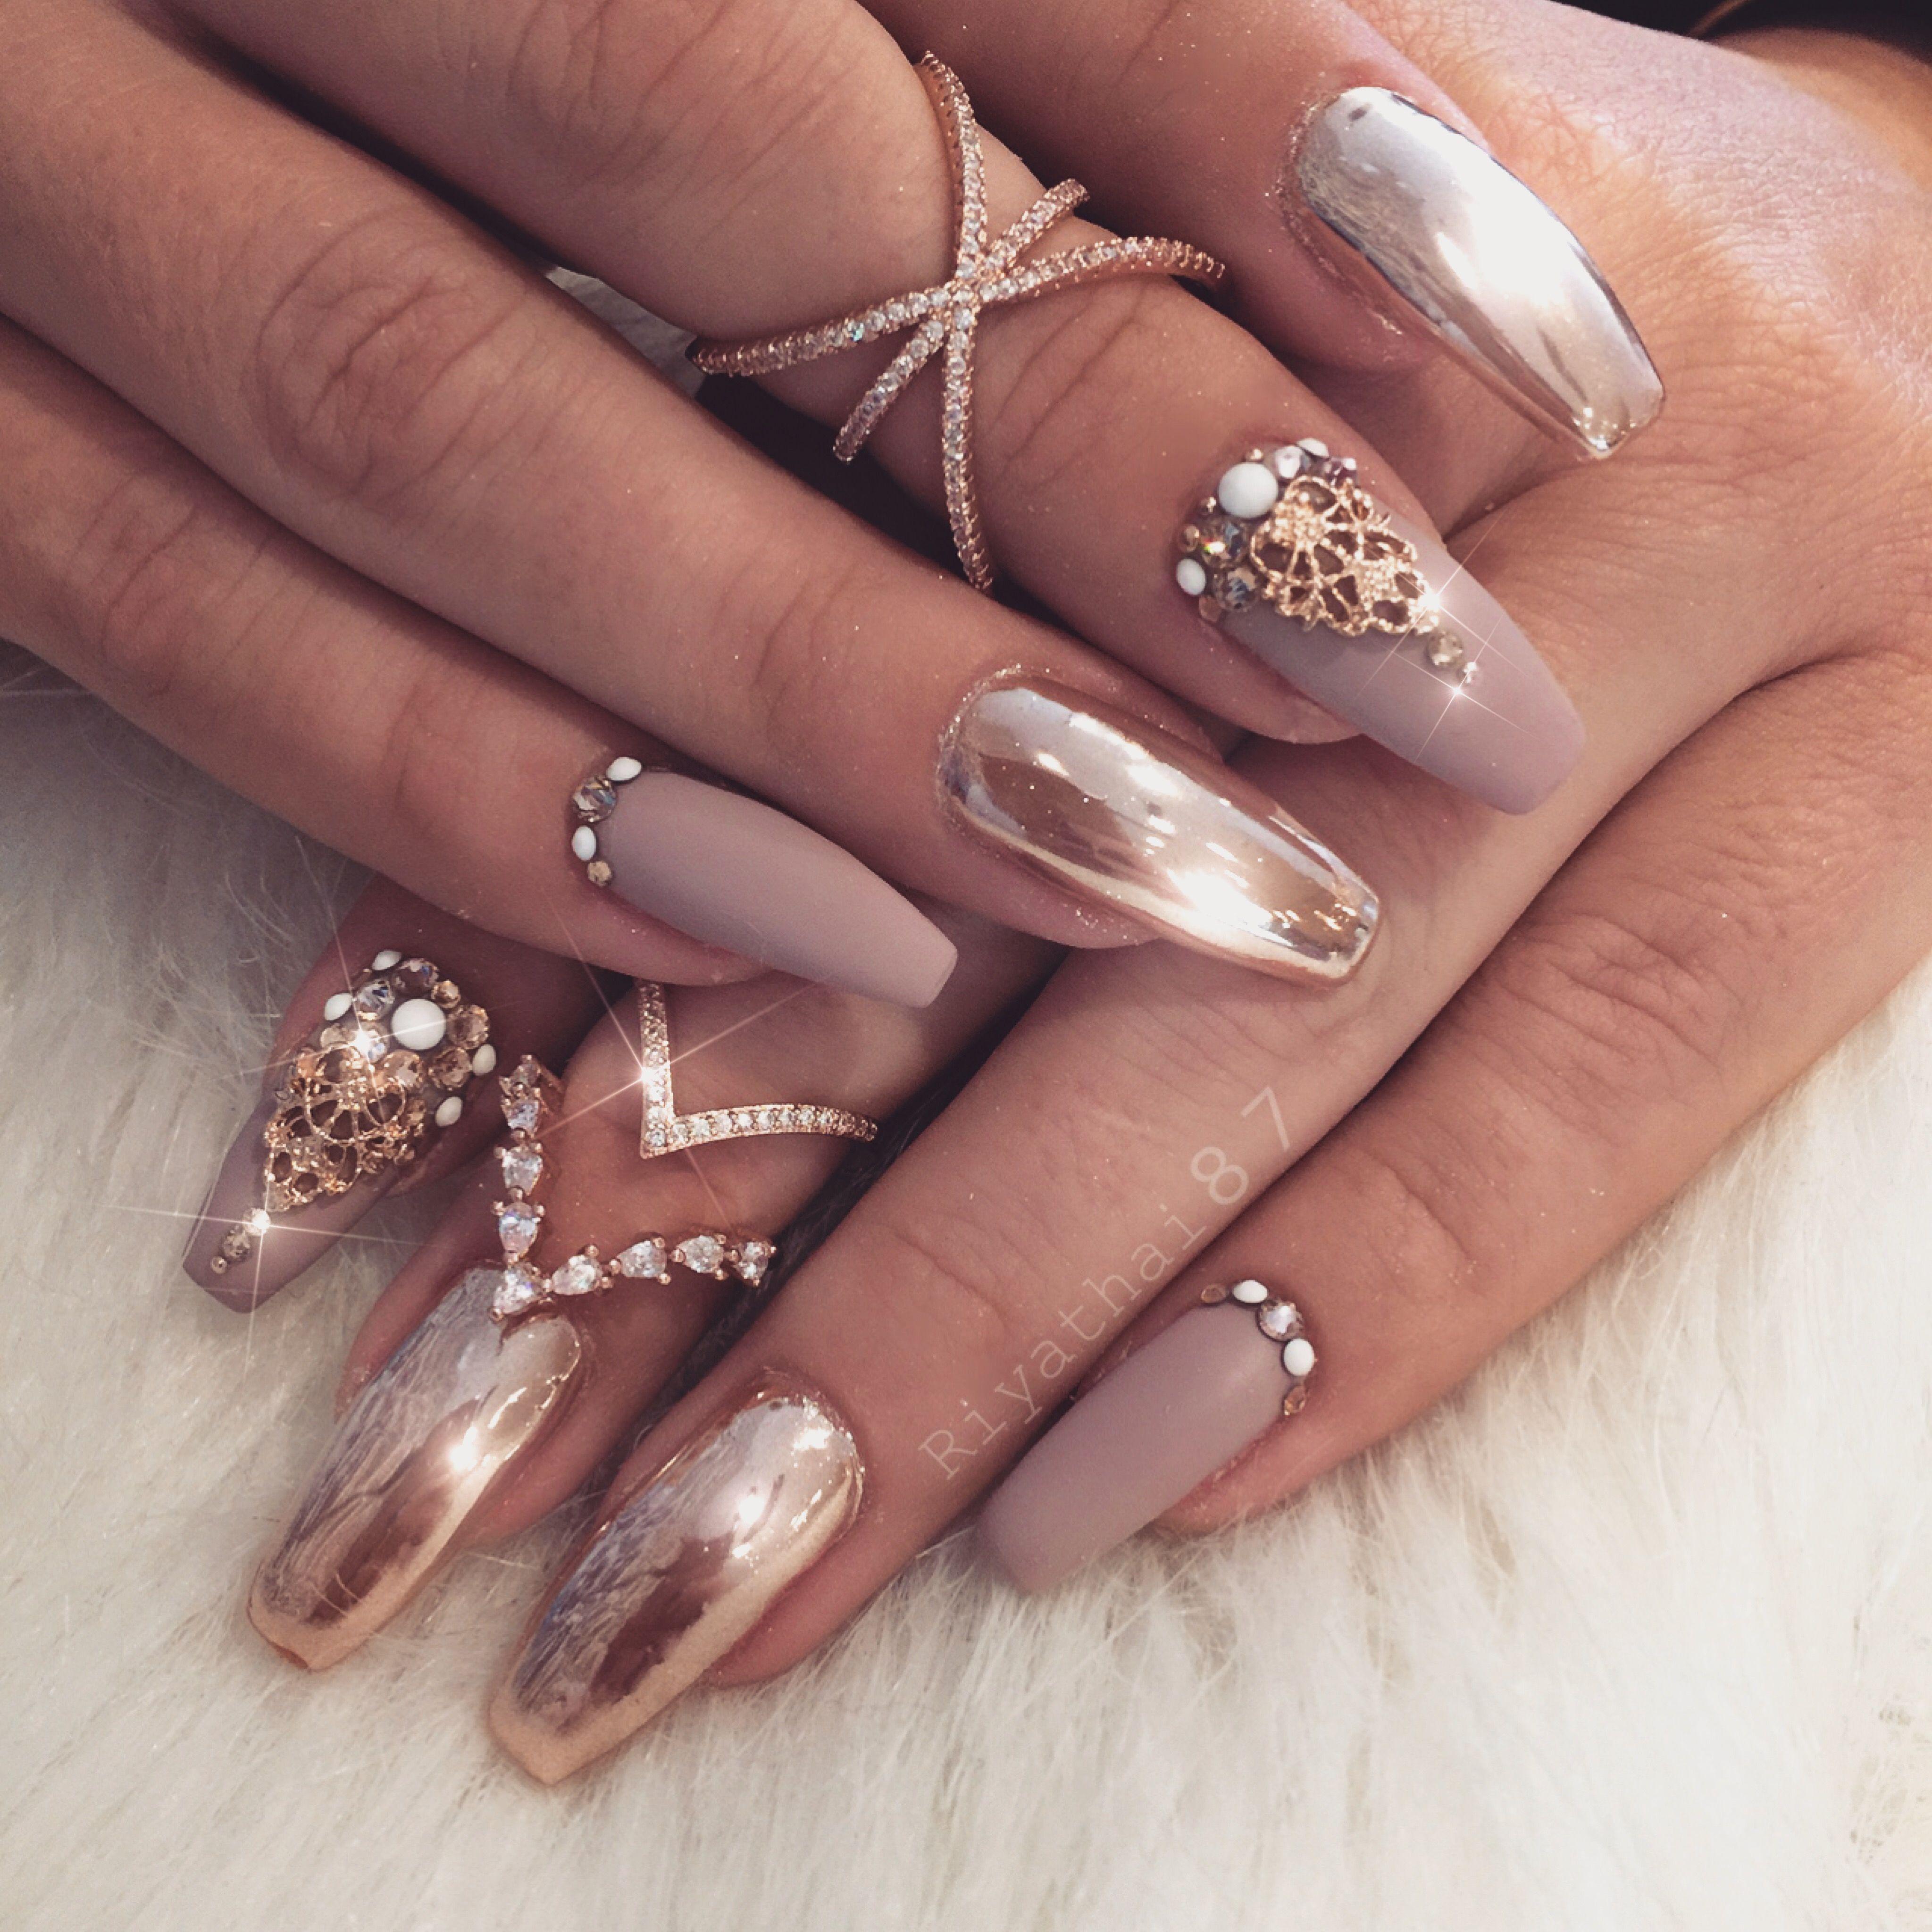 Rosegold Chromebnails | Nail\'d It | Pinterest | Nail nail, Coffin ...